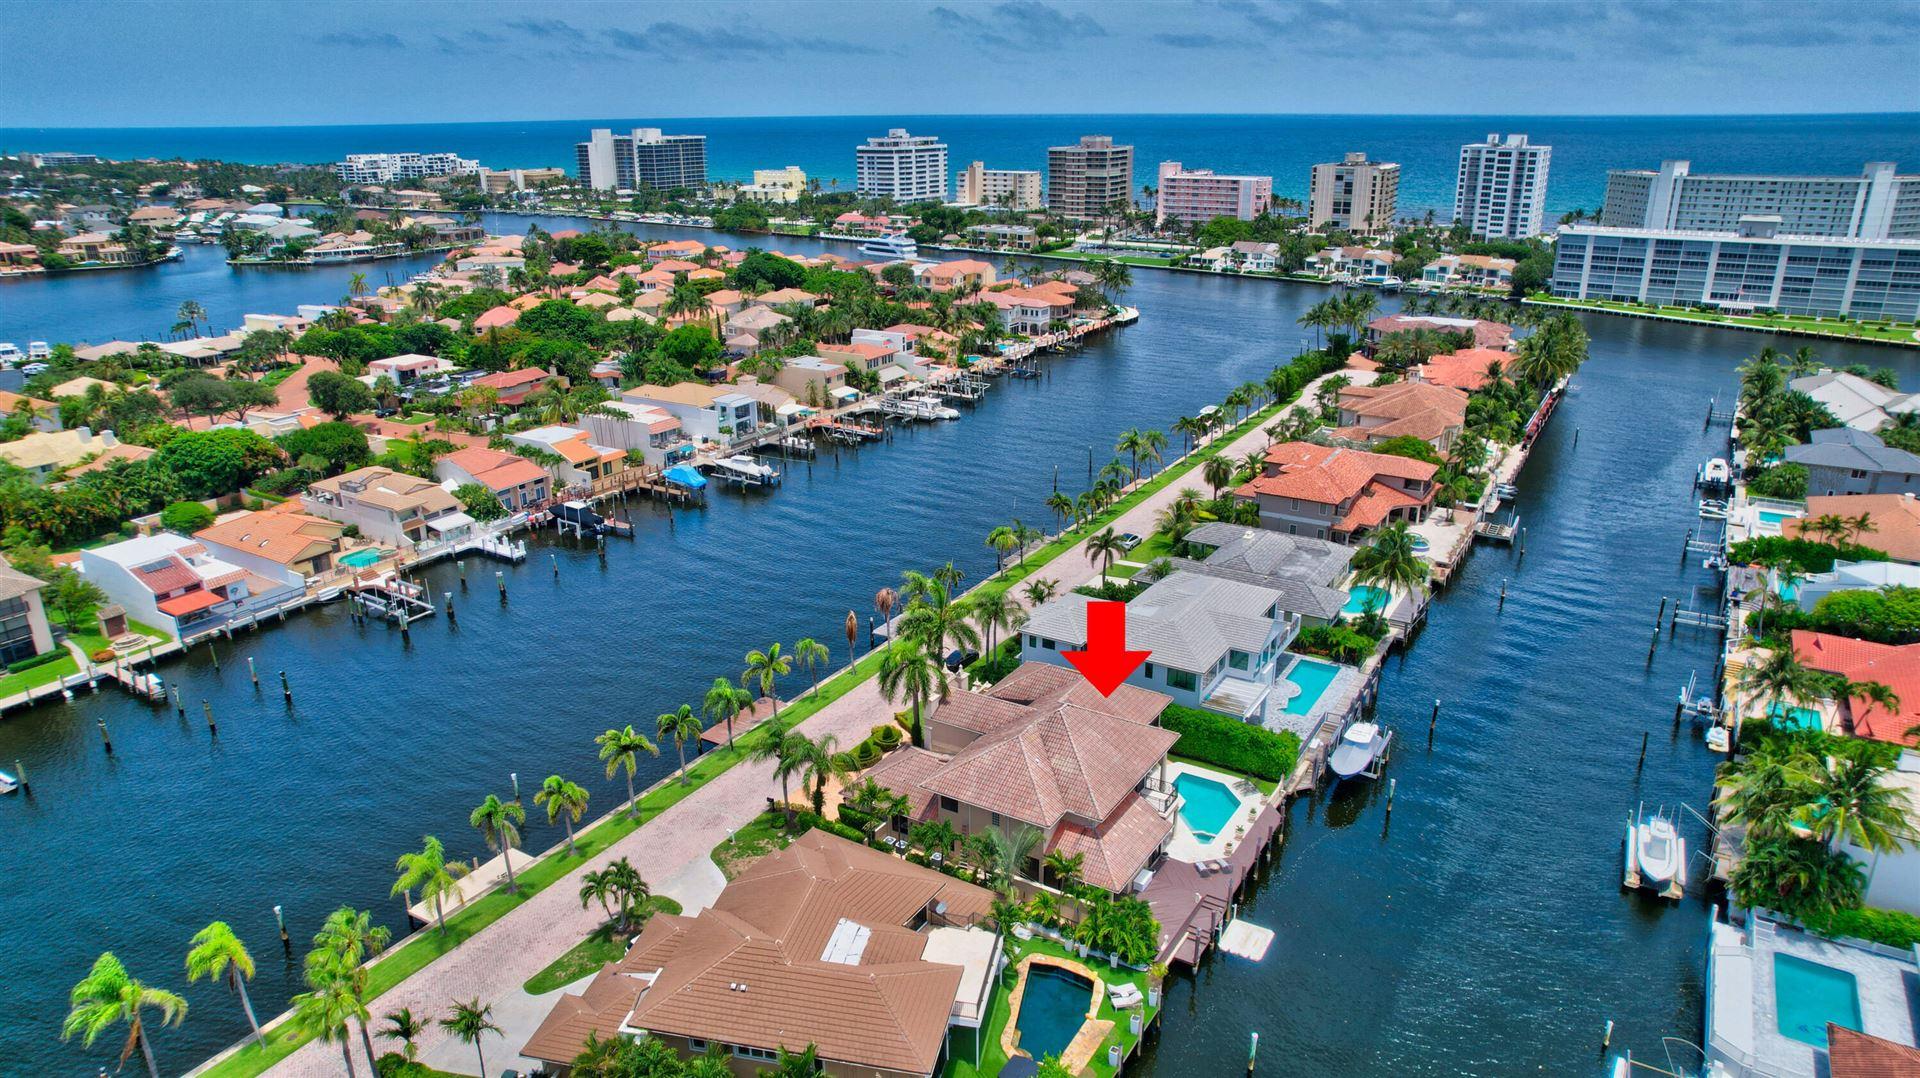 860 Lilac Drive, Boca Raton, FL 33487 - MLS#: RX-10731614